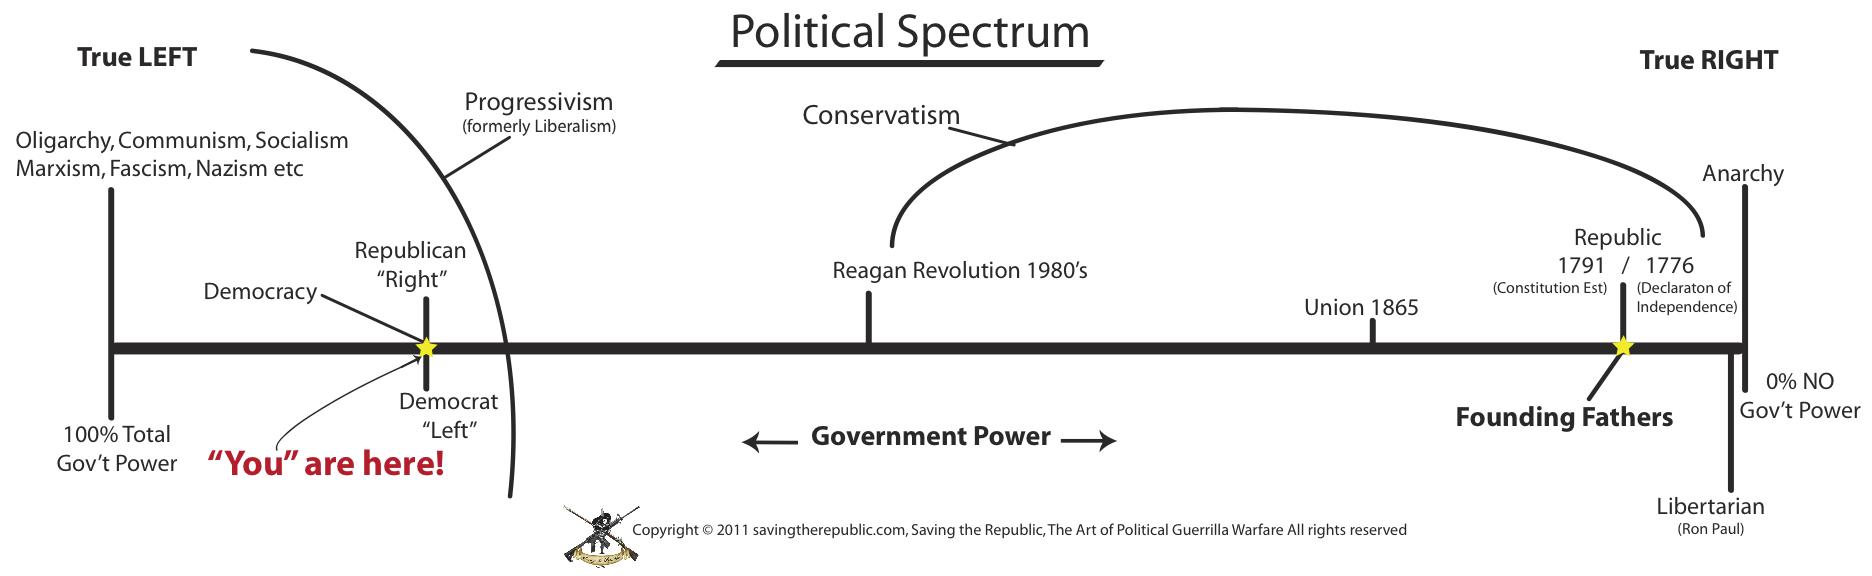 comparing classical vs modern liberalism essay Below is an essay on modern liberalism v modern conservatism in classical and modern liberalism compare and free-essays/modern-liberalism-v-modern.